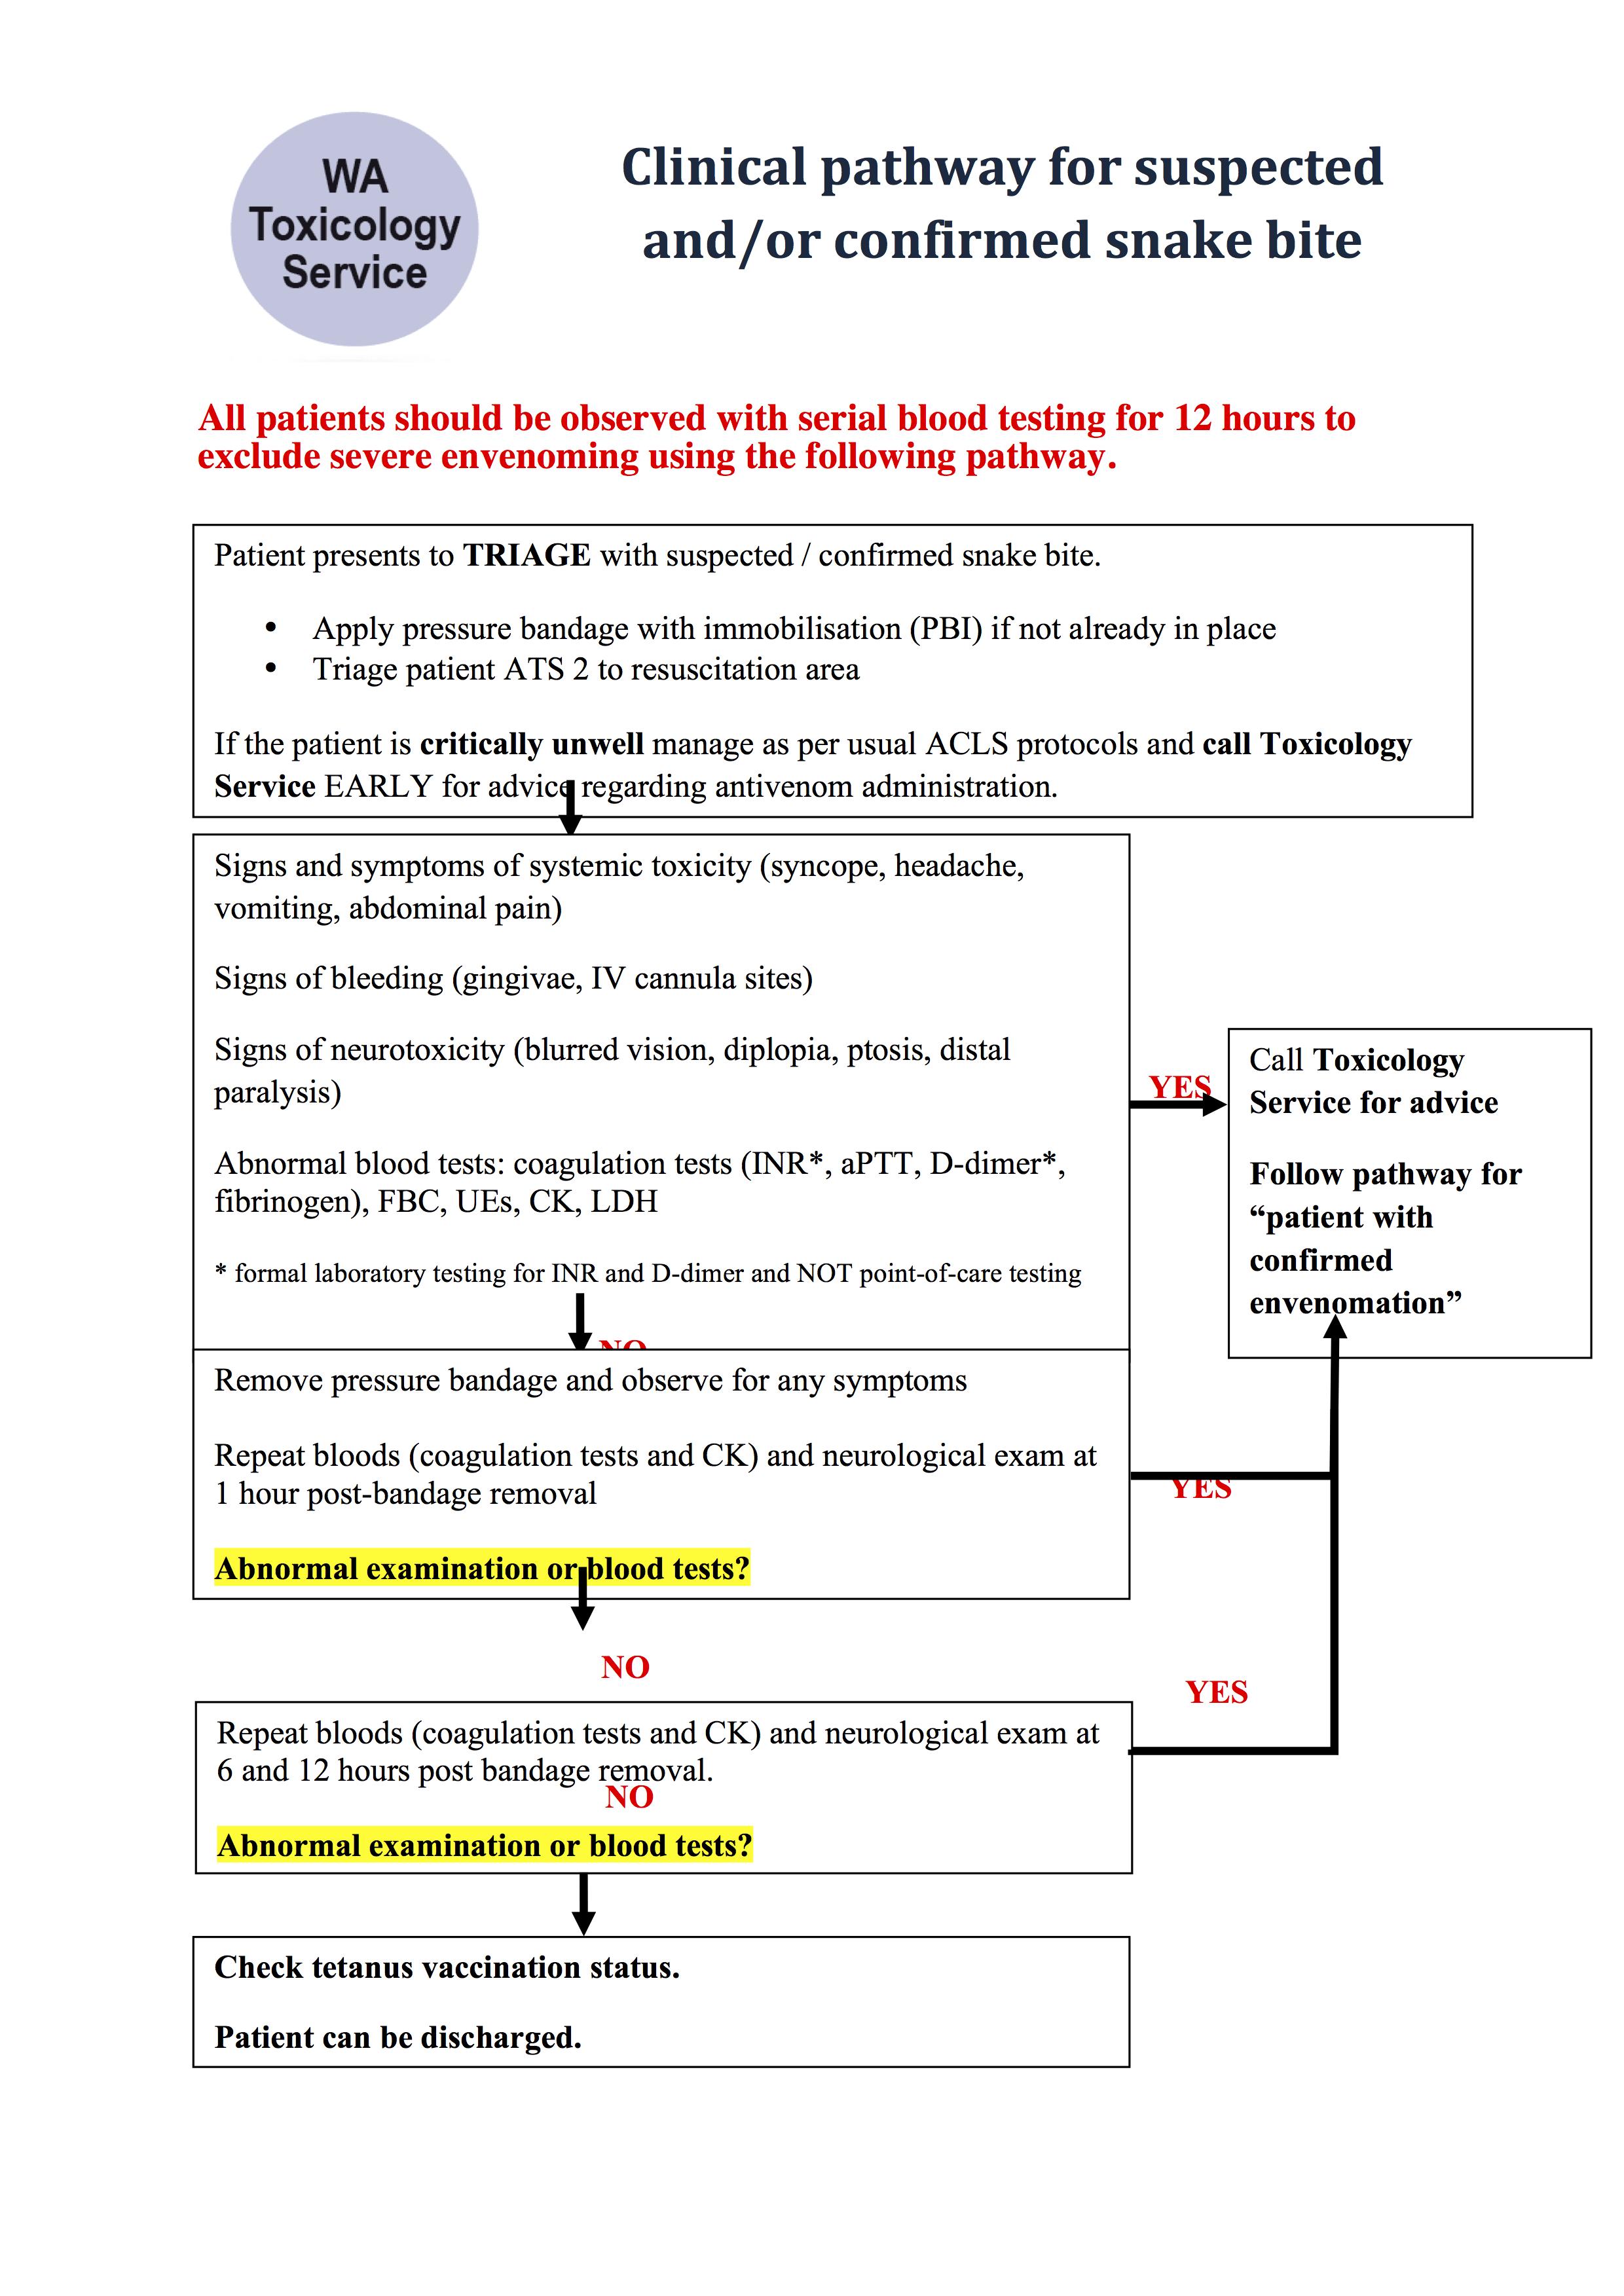 Clinical pathway for snake bite envenomation charlies ed scgh snake bite protocol 82015 nvjuhfo Gallery